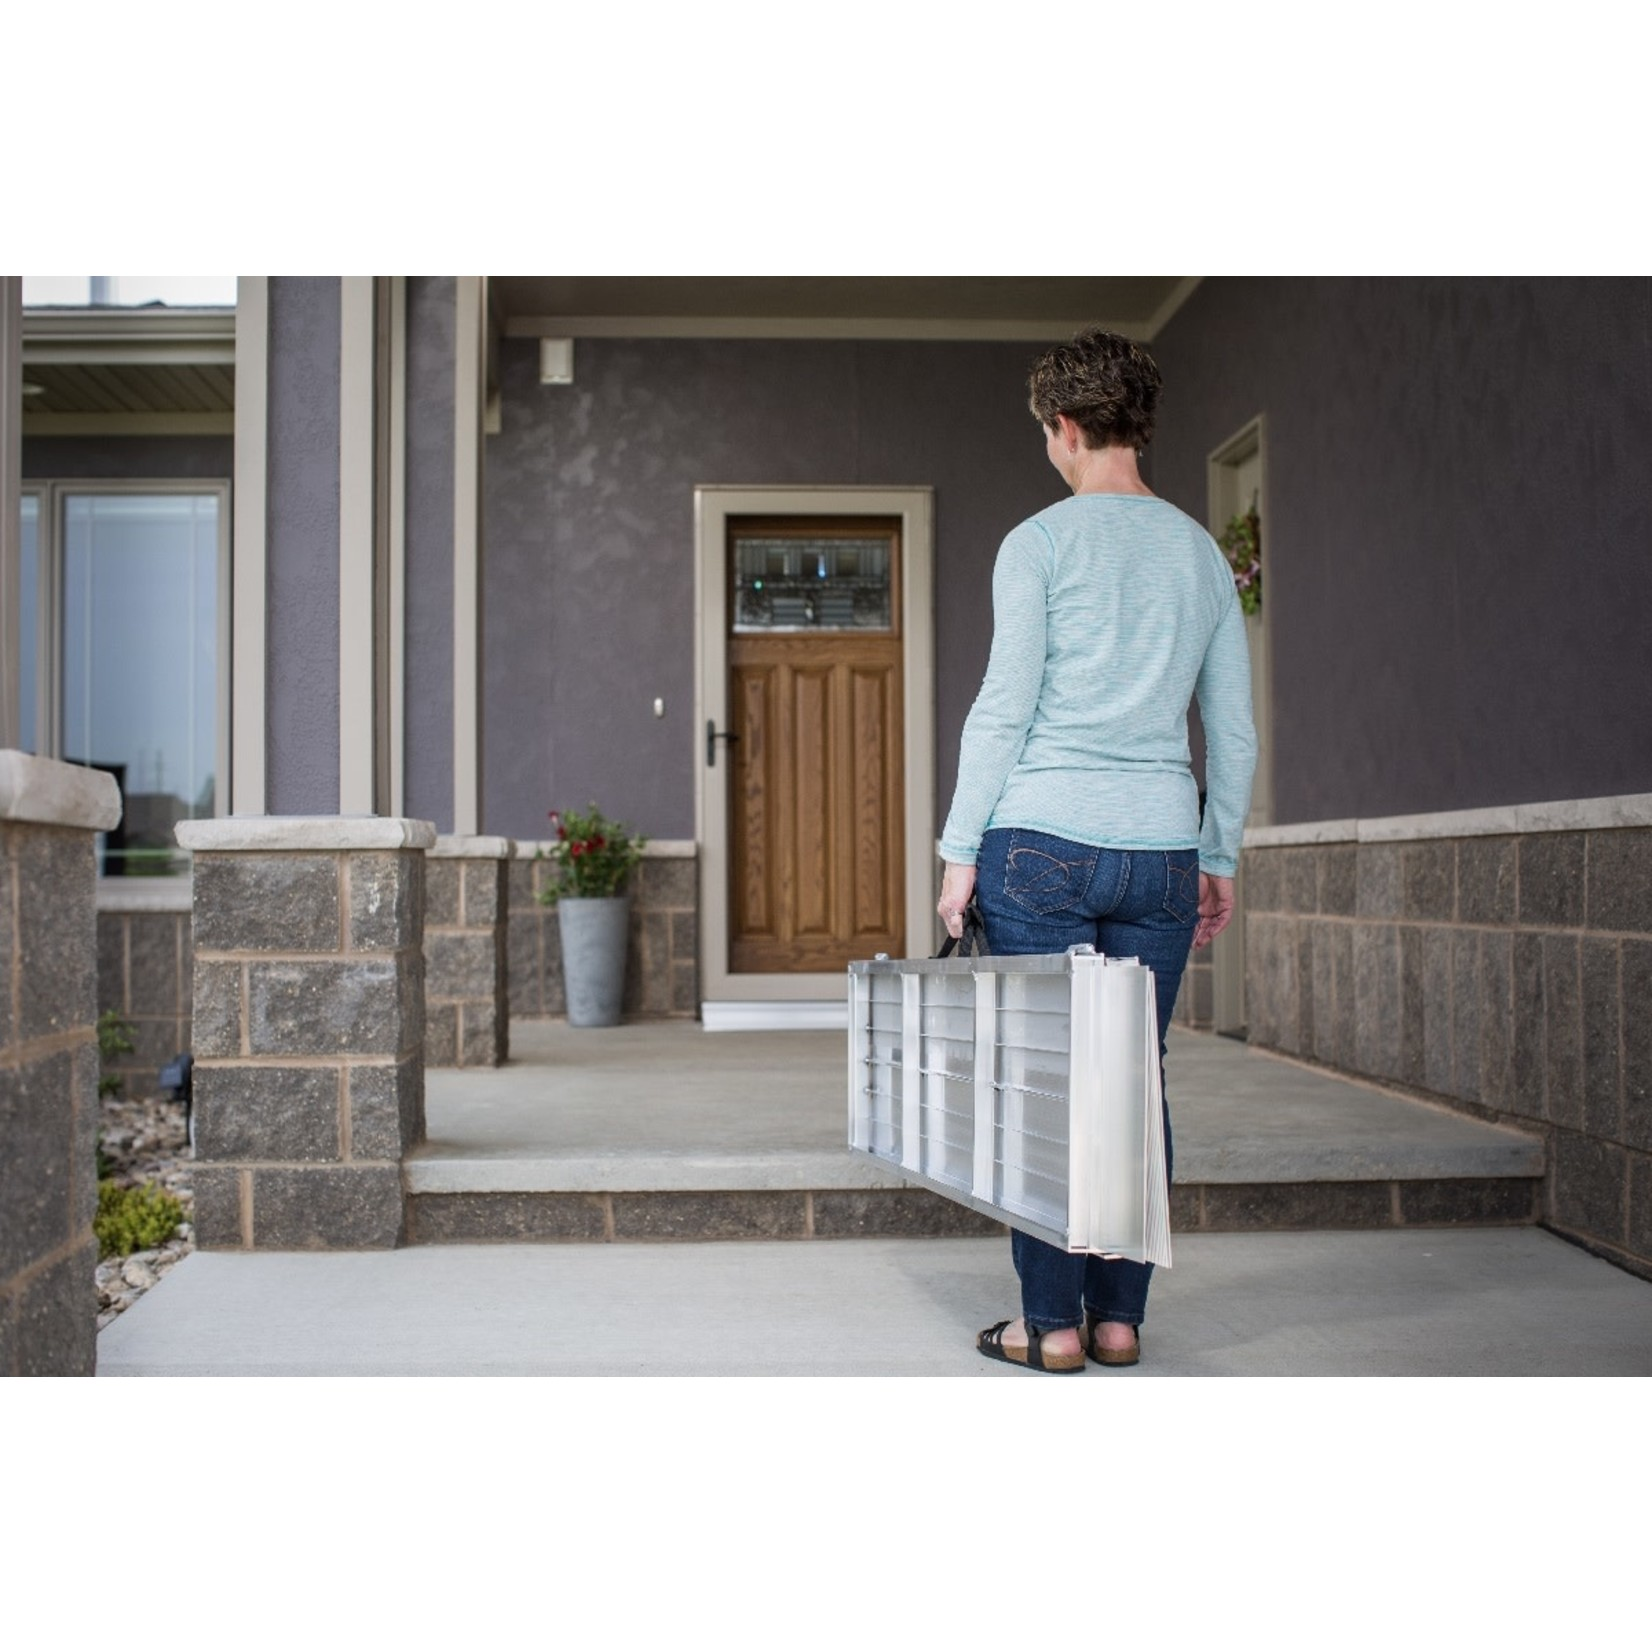 EZ Access SUITCASE® SINGLEFOLD RAMP -SF08